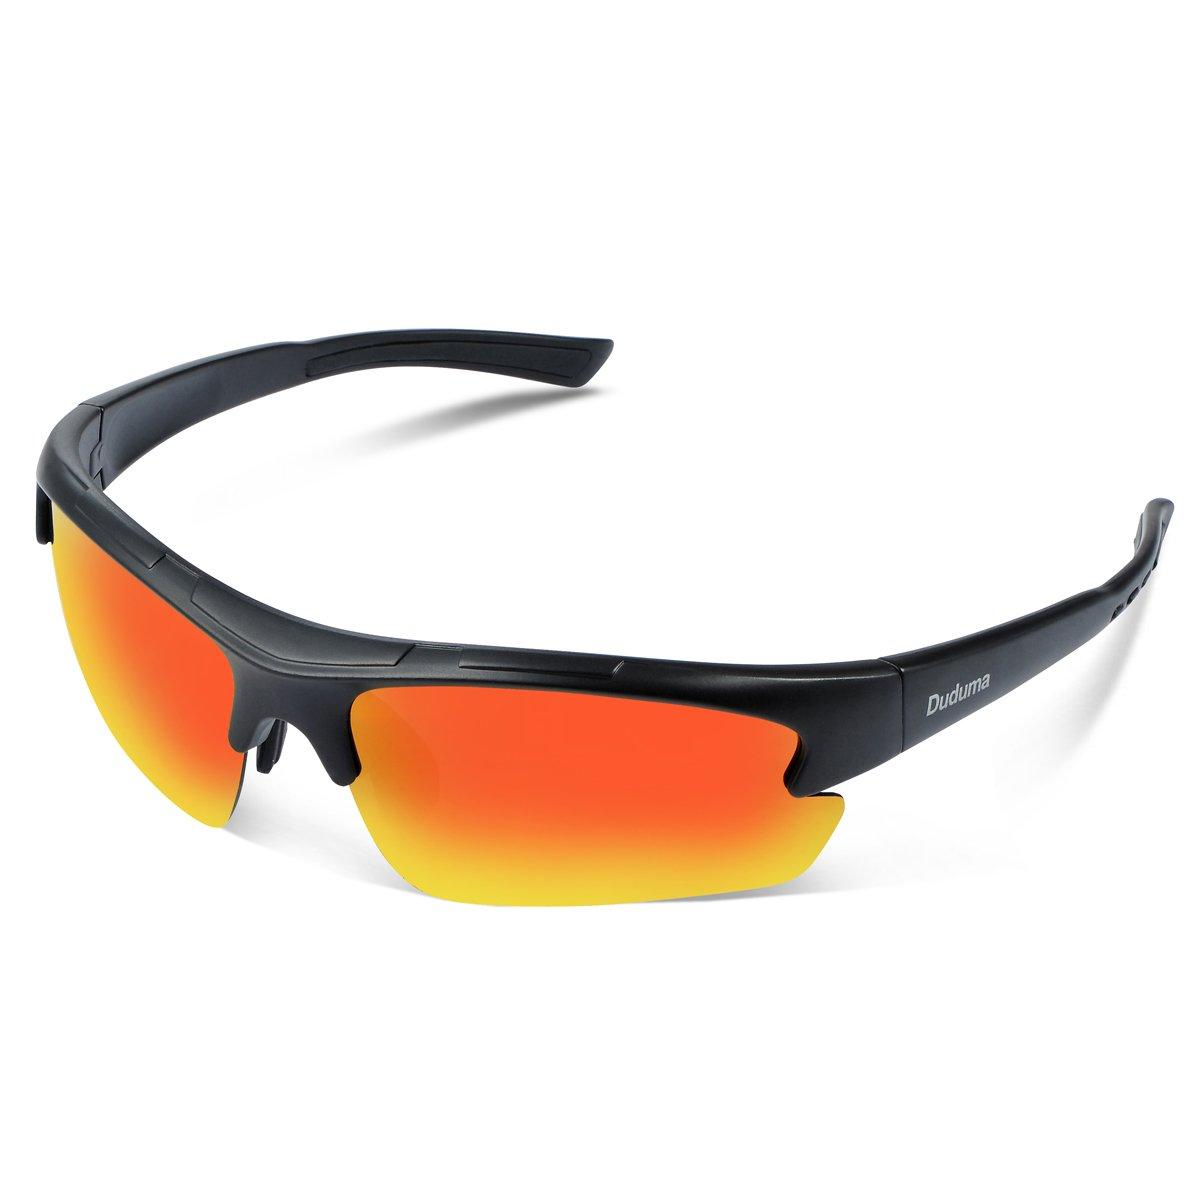 Duduma Polarized Designer Fashion Sports Sunglasses for Baseball Cycling Fishing Golf Tr62 Superlight Frame (Black Matte/red Mirror) by Duduma